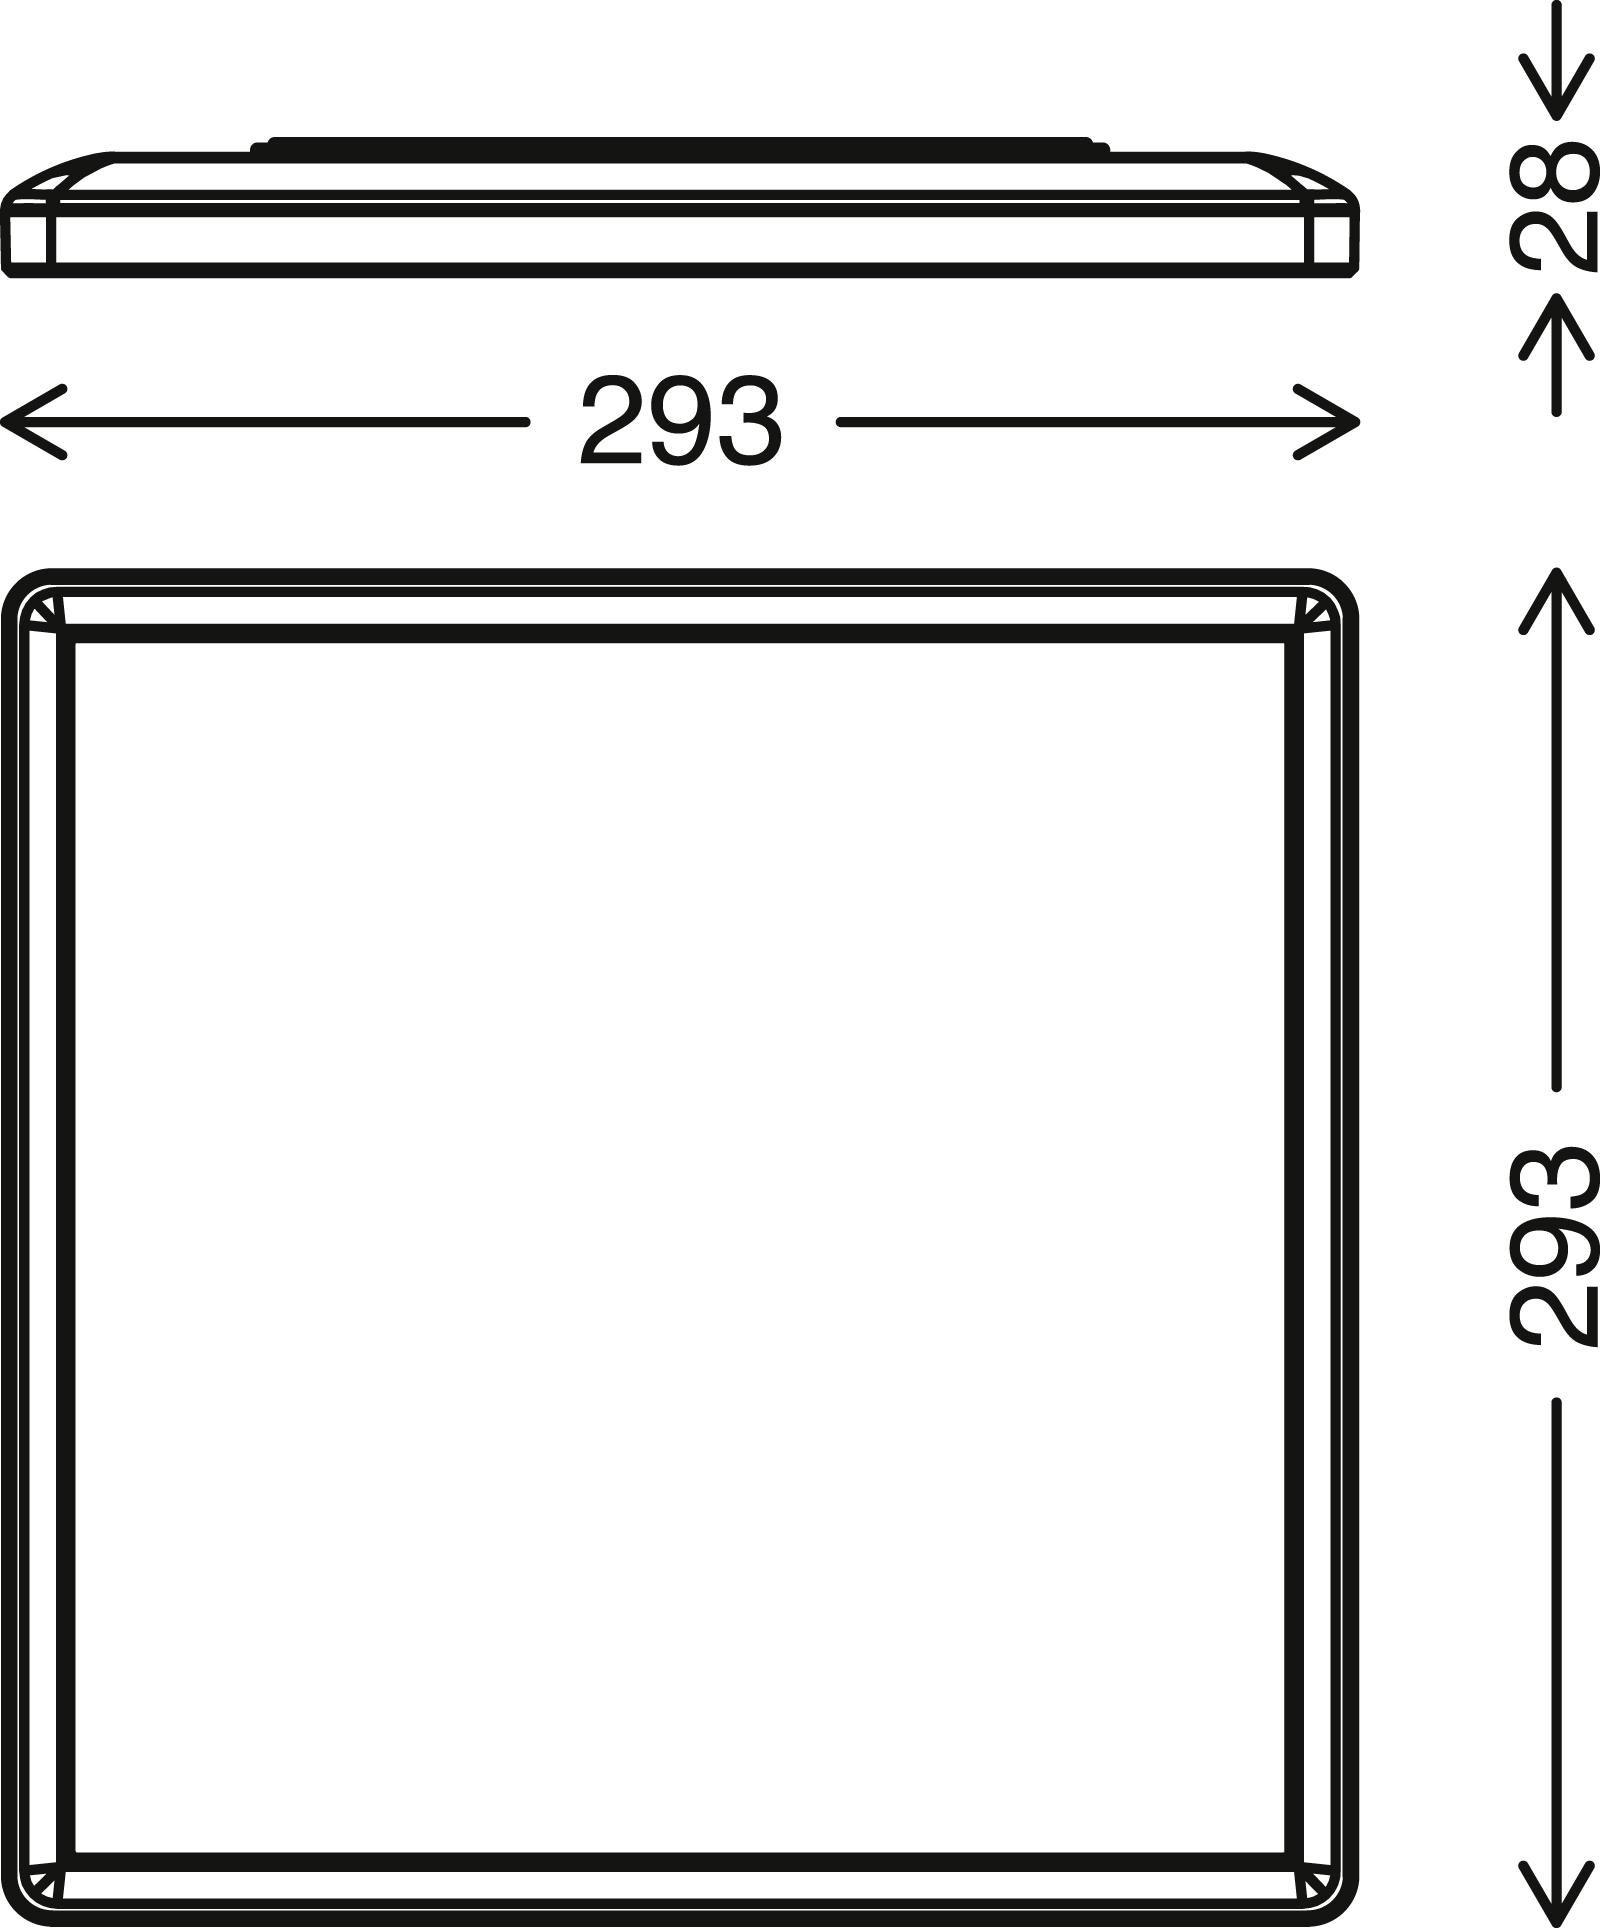 SLIM LED Panel, 29,3 cm, 1850 LUMEN, 15 WATT, Weiss